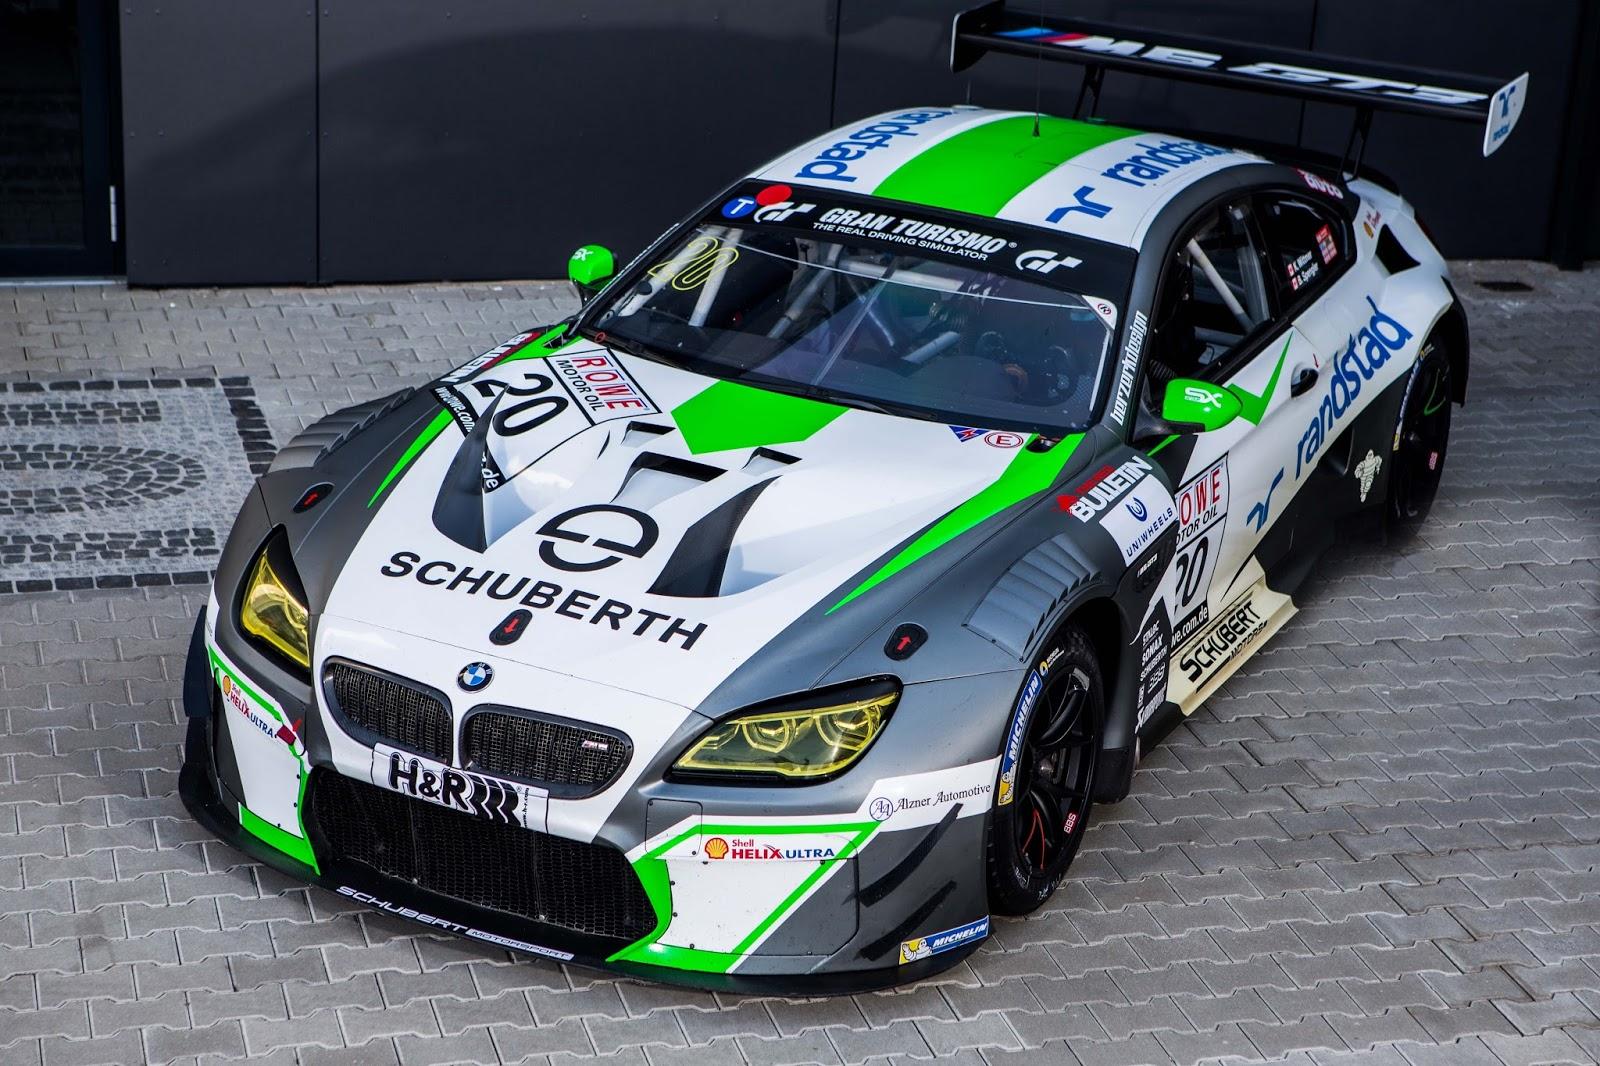 P90255233 highRes 21st april 2017 muni Η BMW Motorsport ξεκινά τη νέα σεζόν με ισχυρούς εταίρους Akrapovič, BMW, Bmw Bank, BMW M4 DTM, BMW M6, BMW M6 GT3, BMW Motorsport, DTM, Red Bull, Samsung, Shell, αγωνες